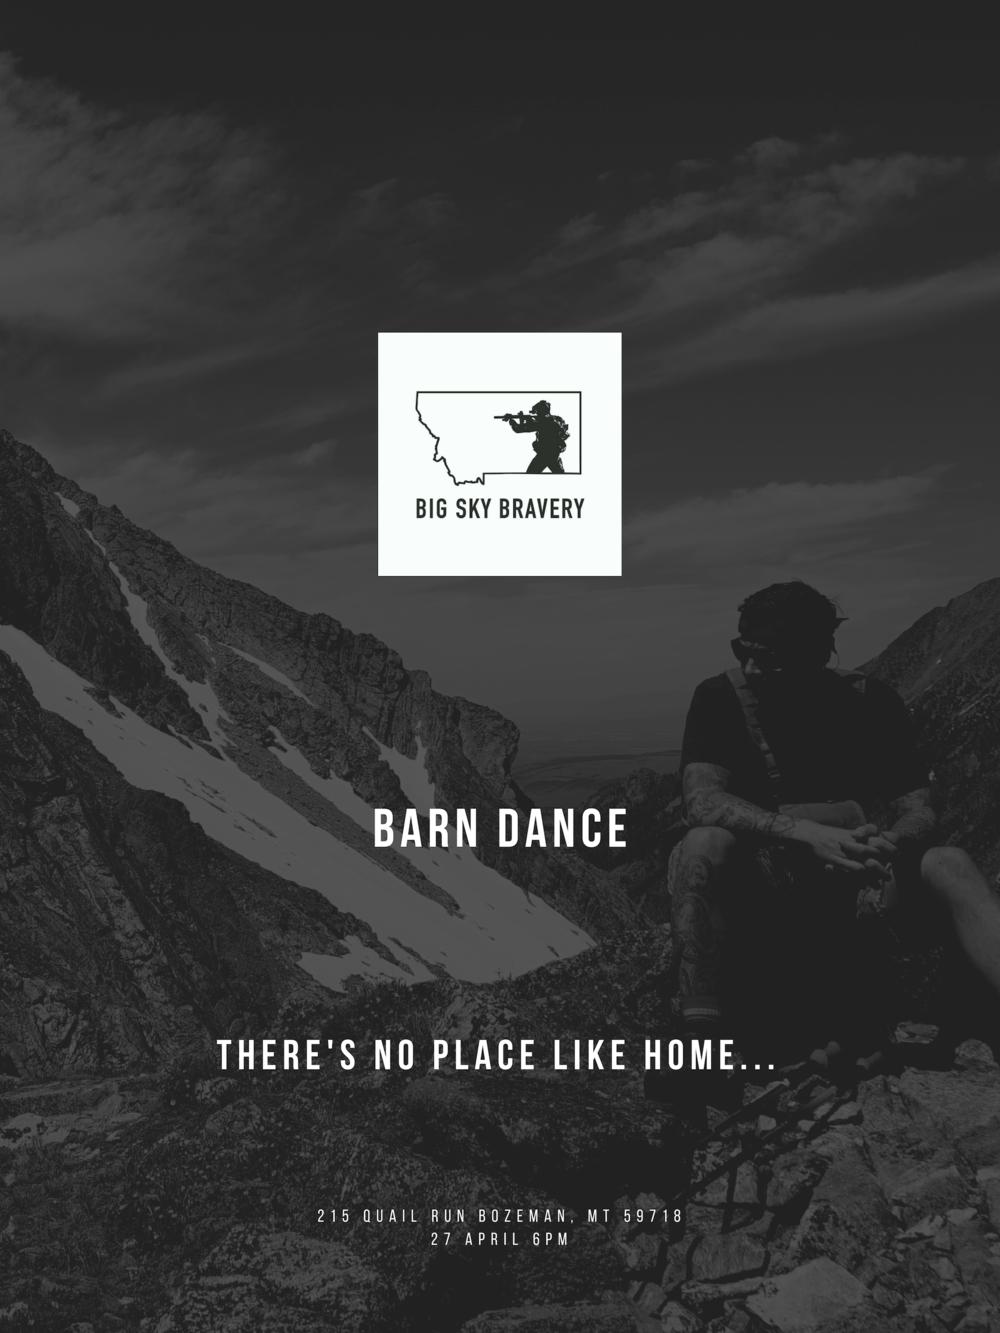 Big sky bravery barn dance.png